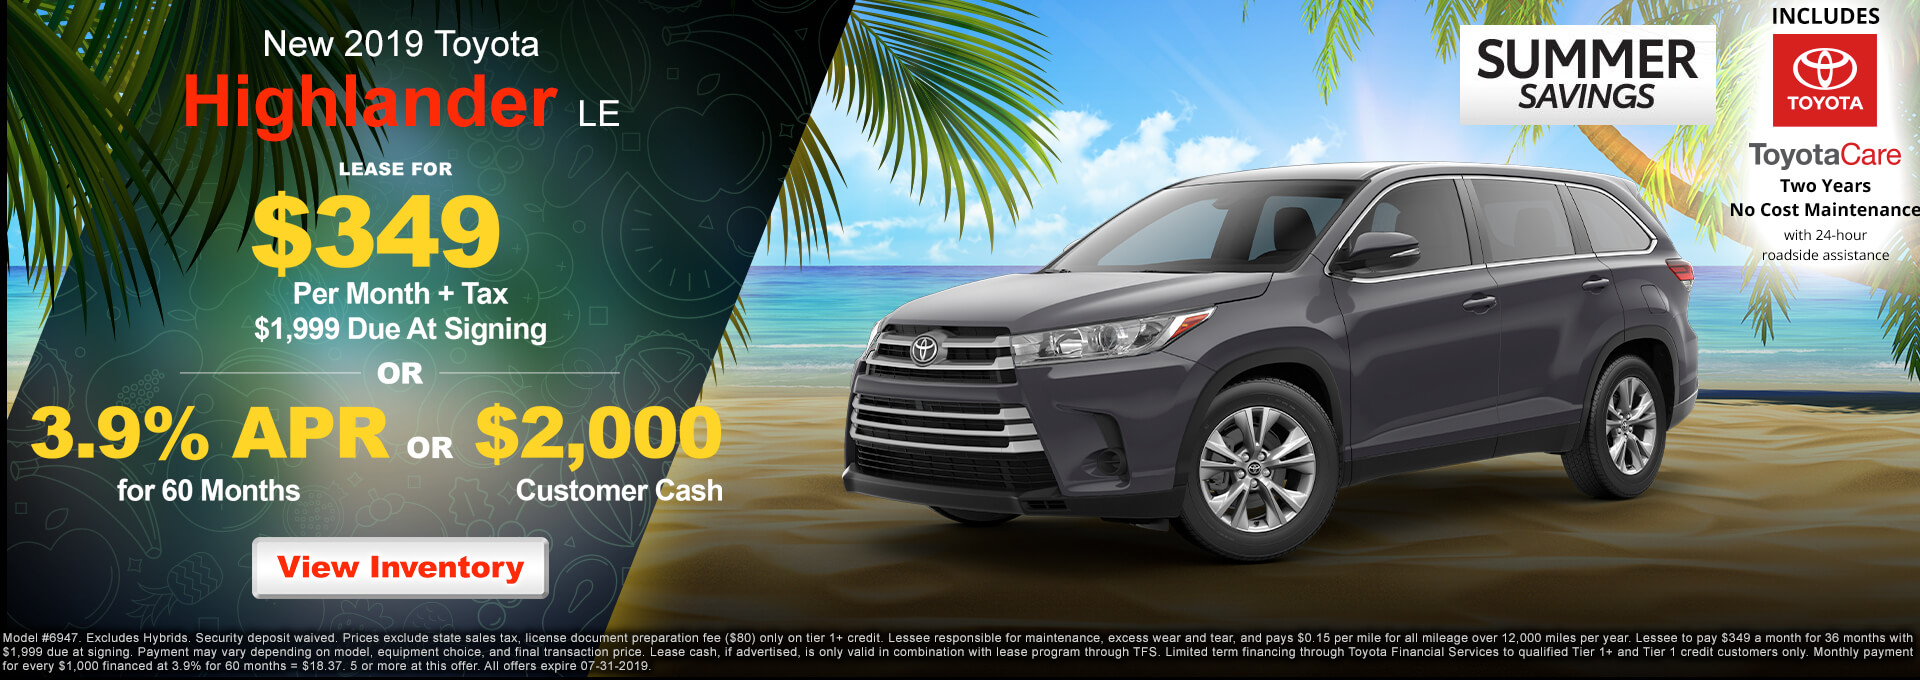 2019 Toyota Highlander $349